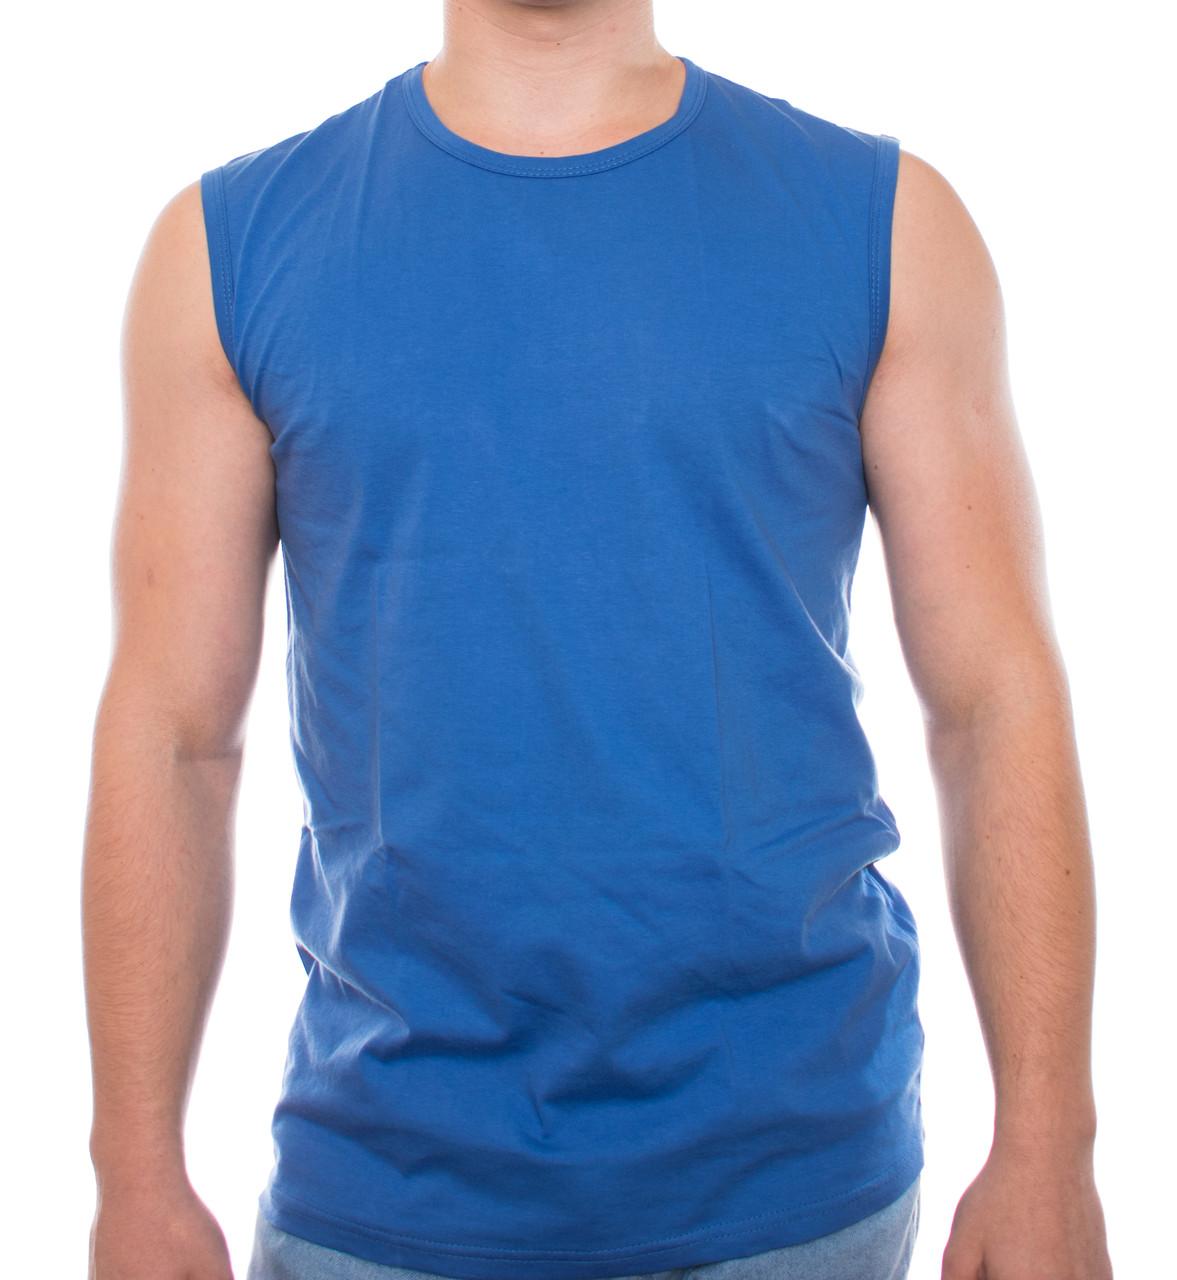 Мужская футболка без рукавов Bono 000154